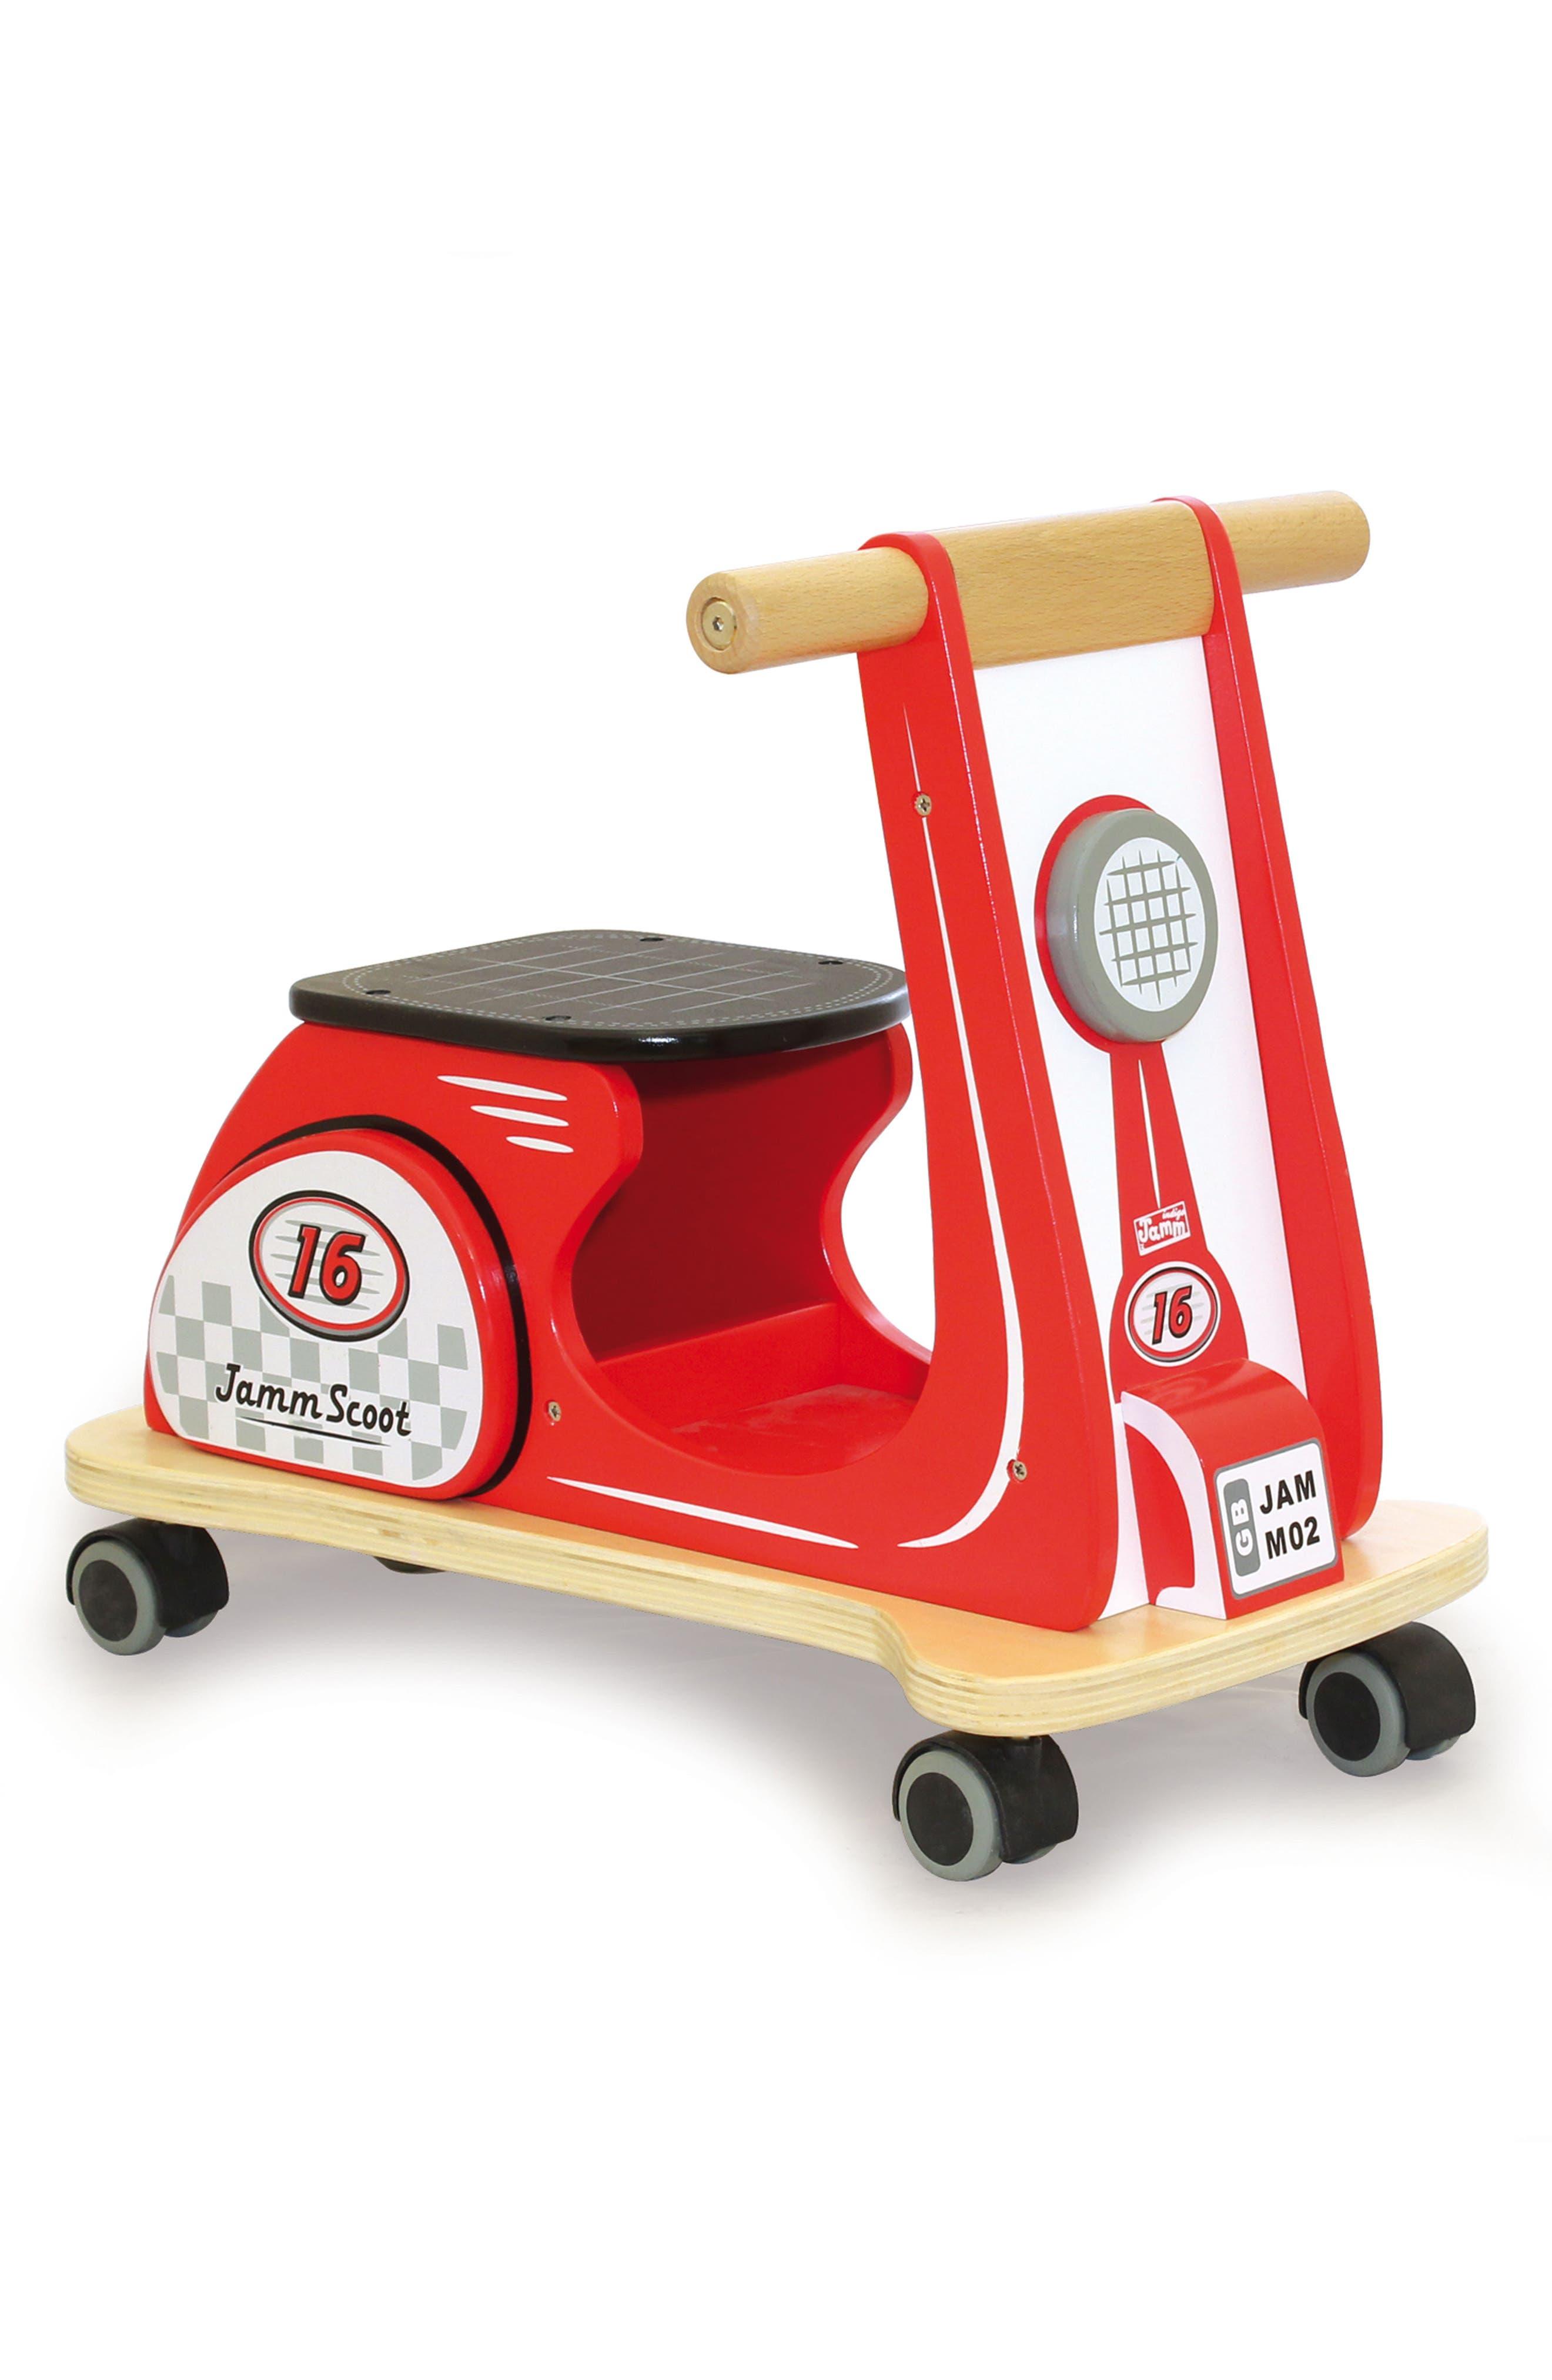 Main Image - Indigo Jamm Scooter Push-Pull Toy